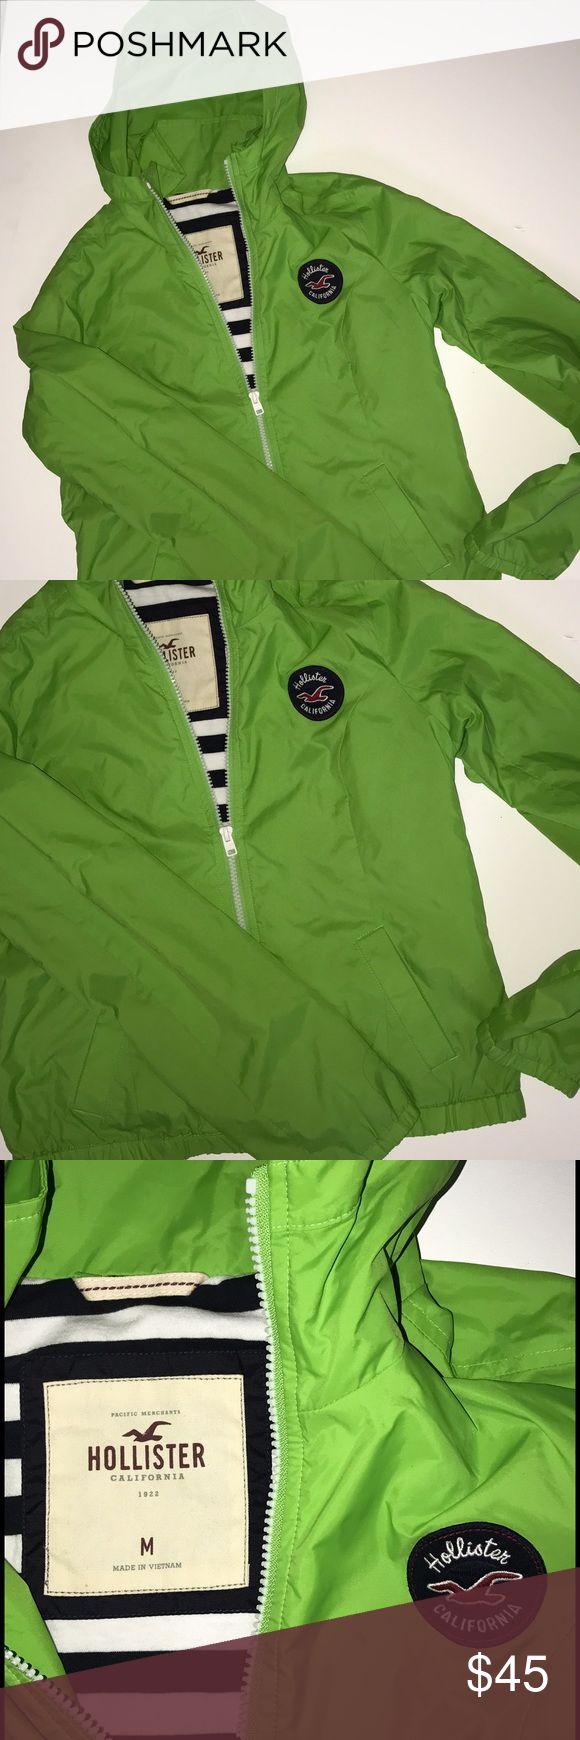 HOLLISTER CALIFORNIA FLIGHT JACKET NWOT NWOT, hooded flight jacket with logo. pretty green, lightly lined. size med fits snug Hollister Jackets & Coats